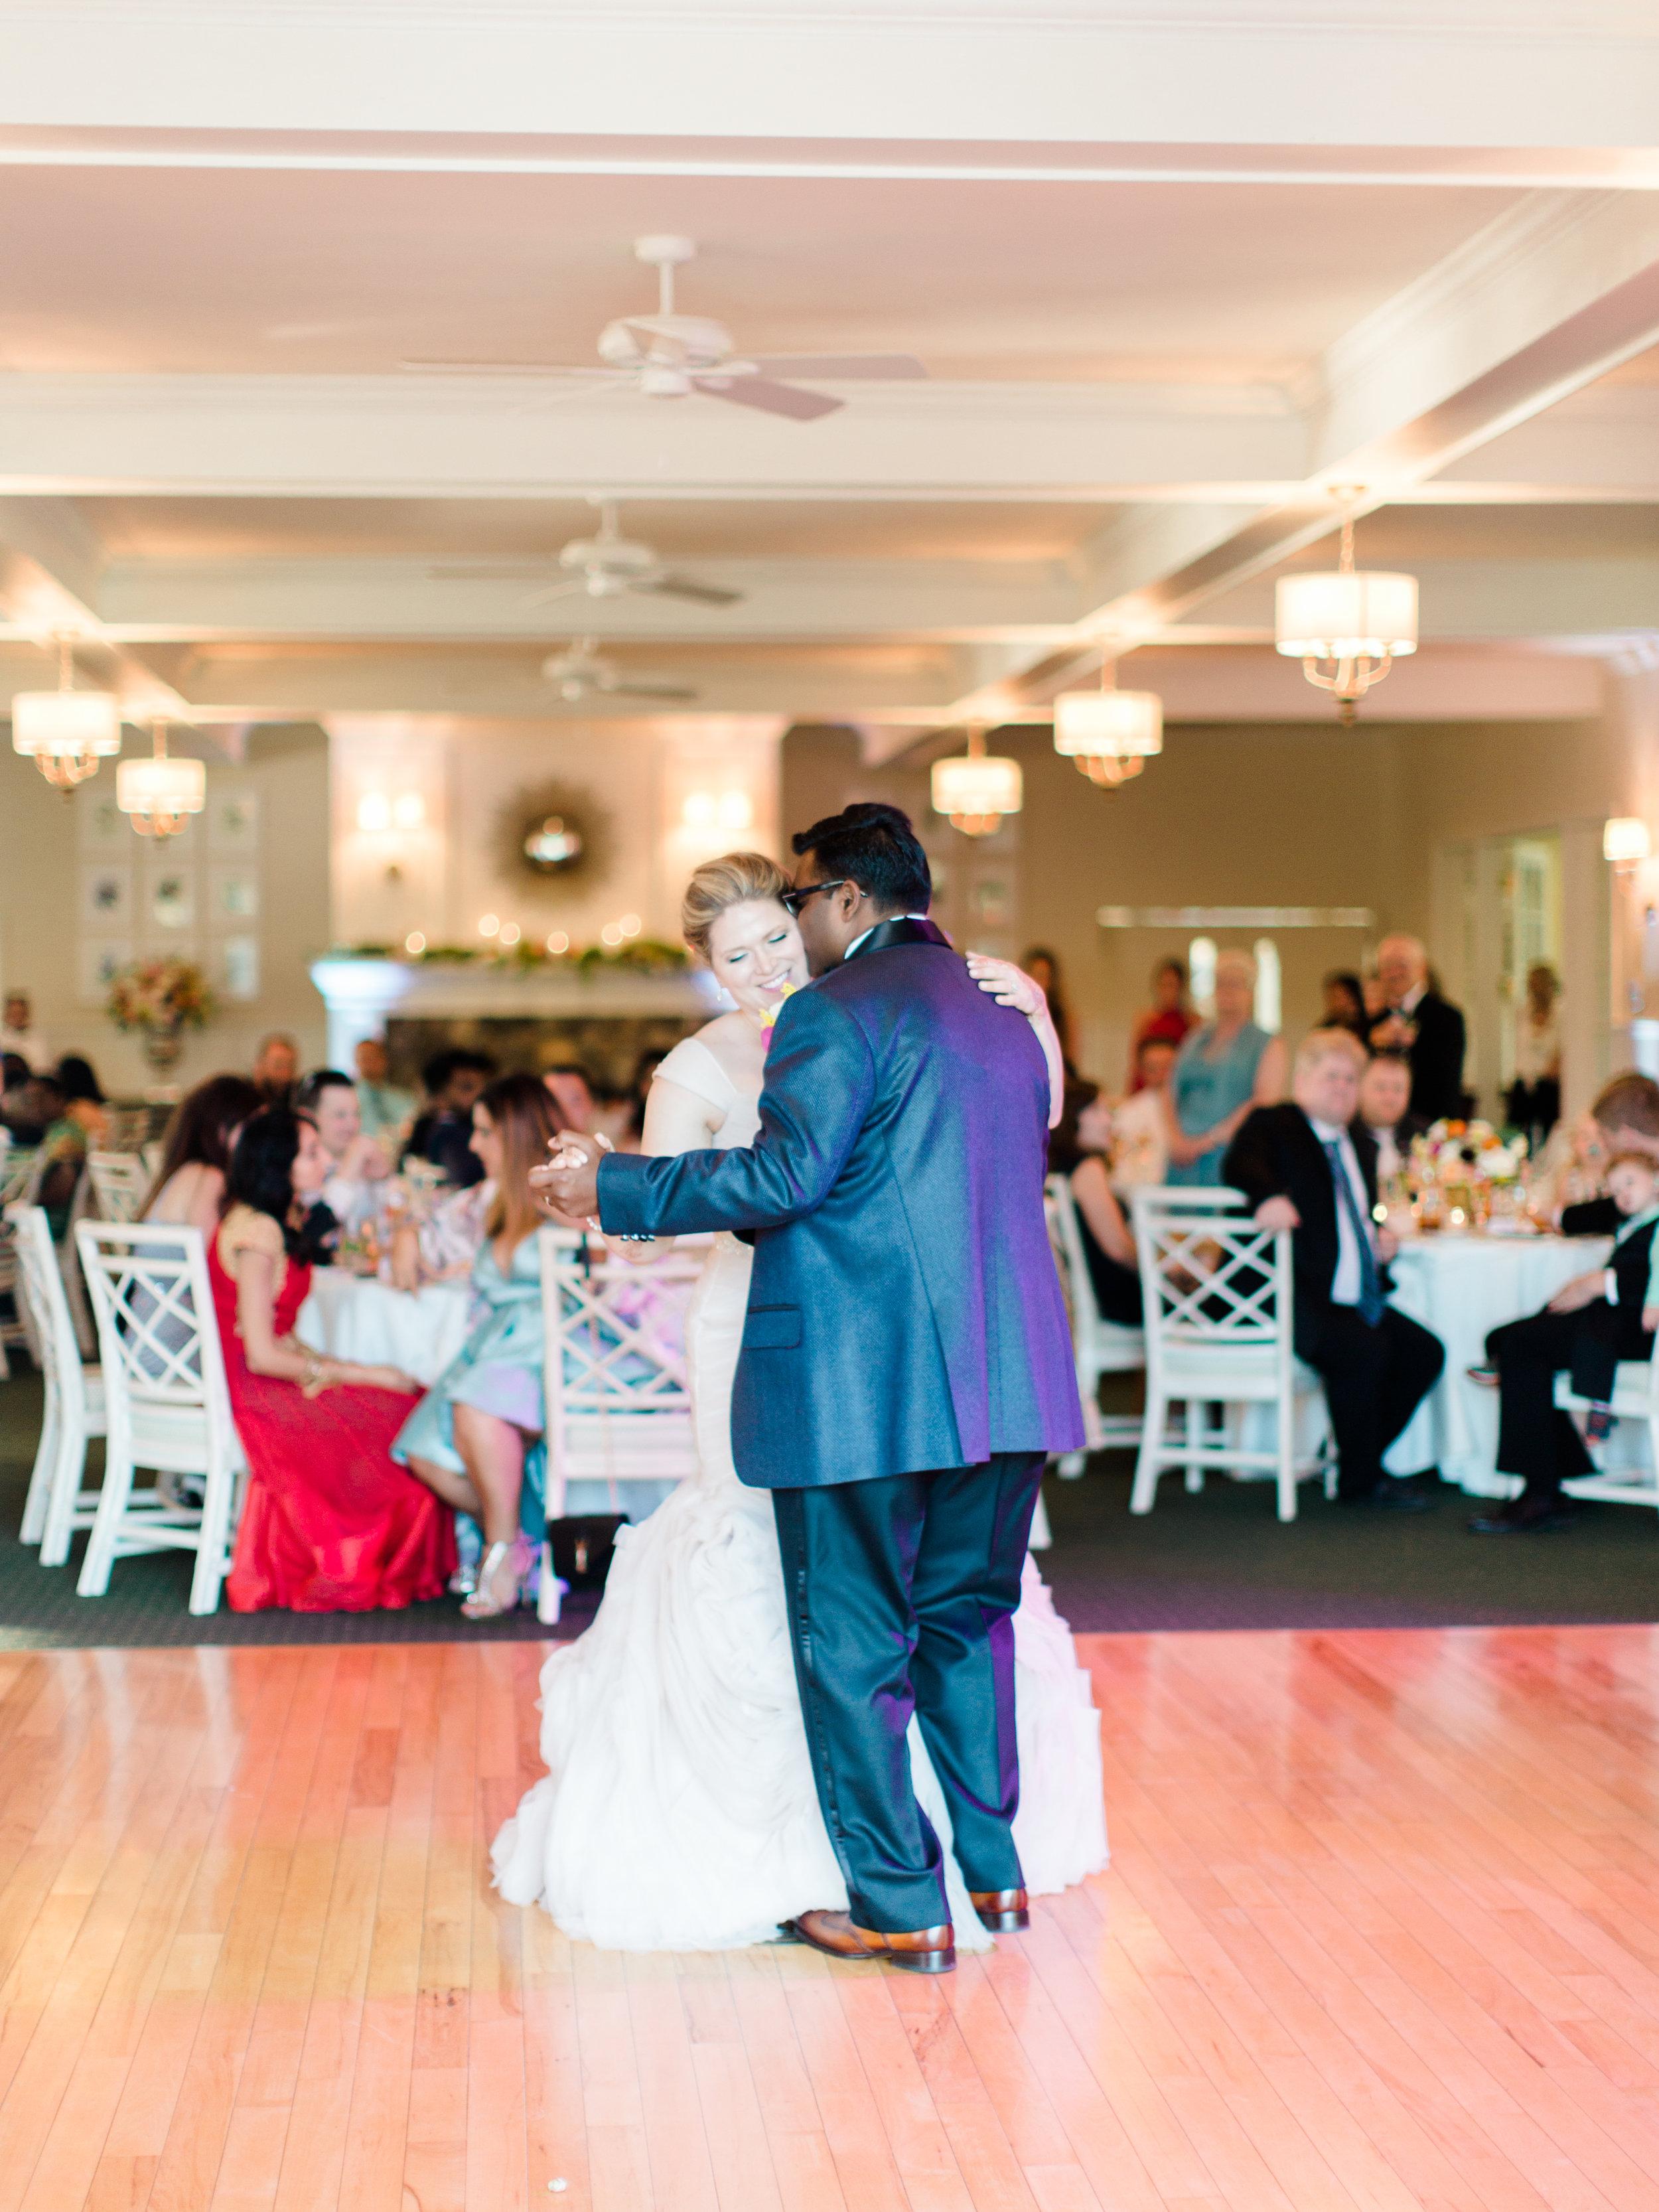 Govathoti+Wedding+Reception+BGFirst Dance-1.jpg